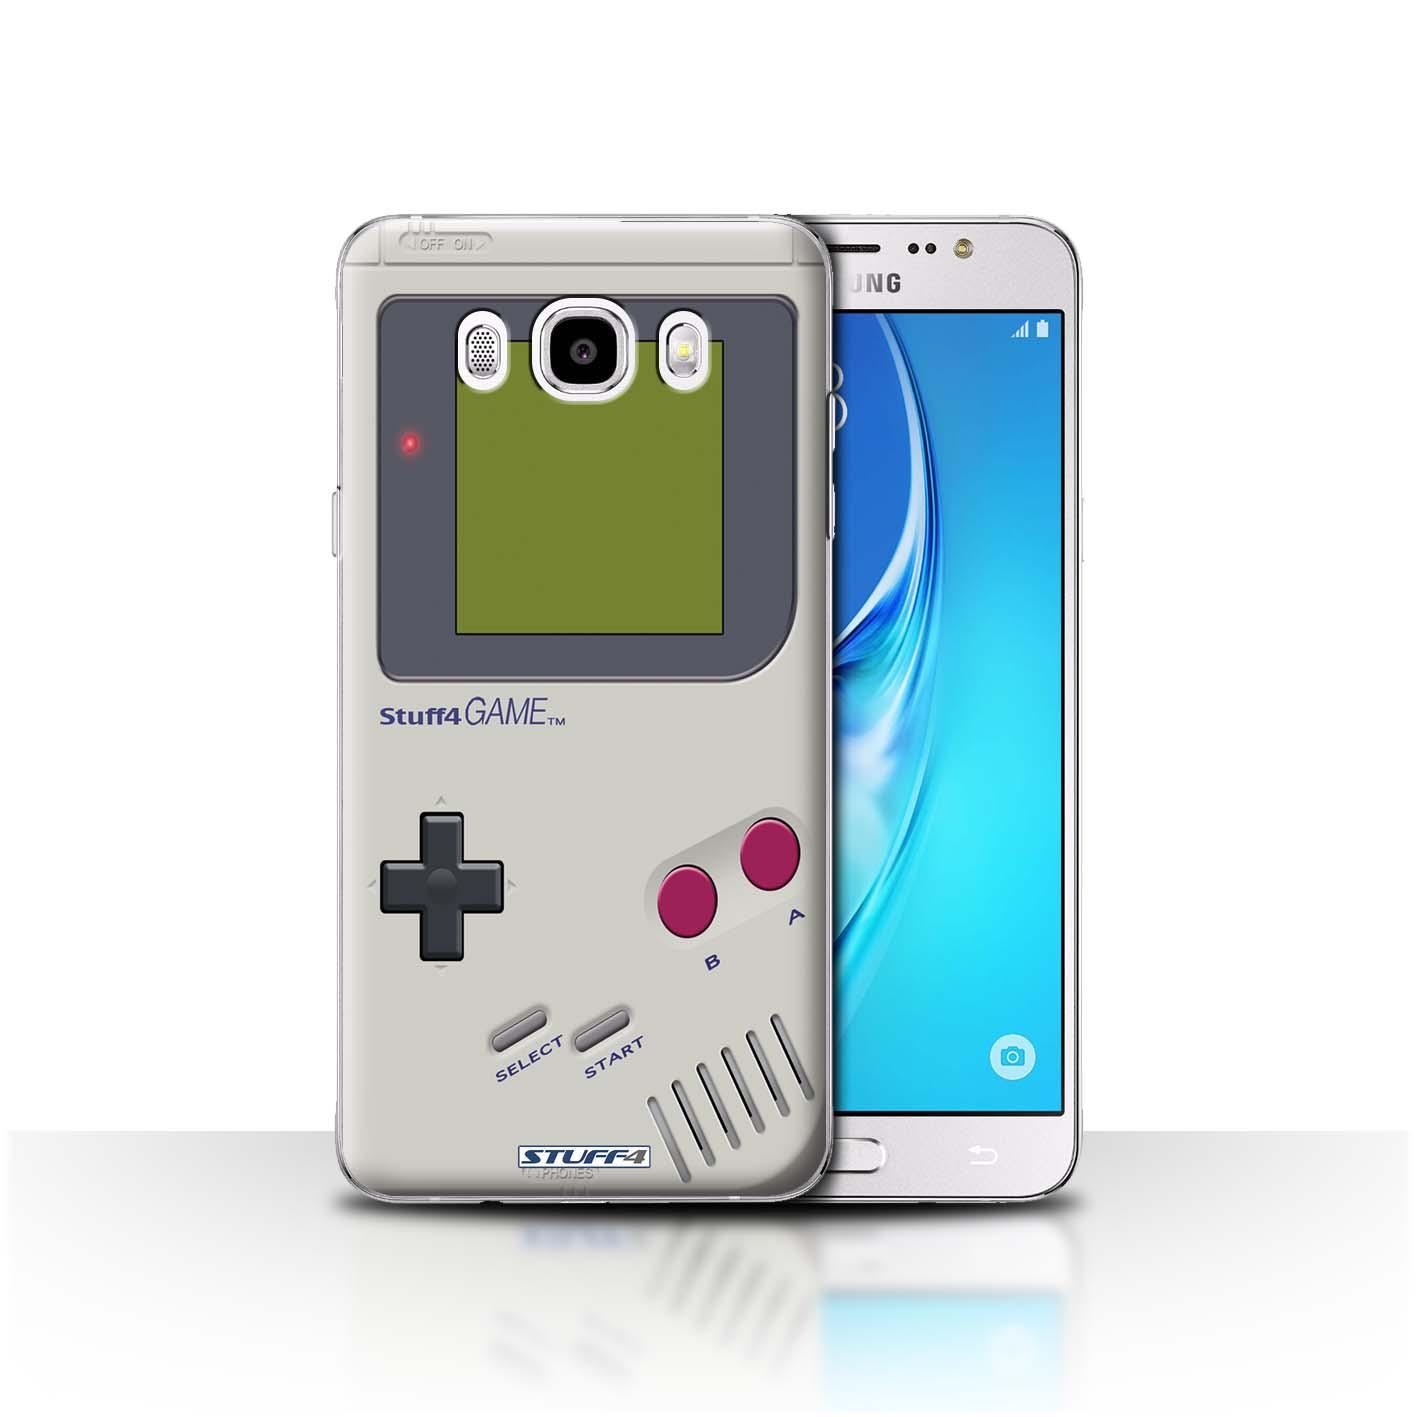 buy online 60350 c3dca Designs for Samsung Galaxy J5 2016